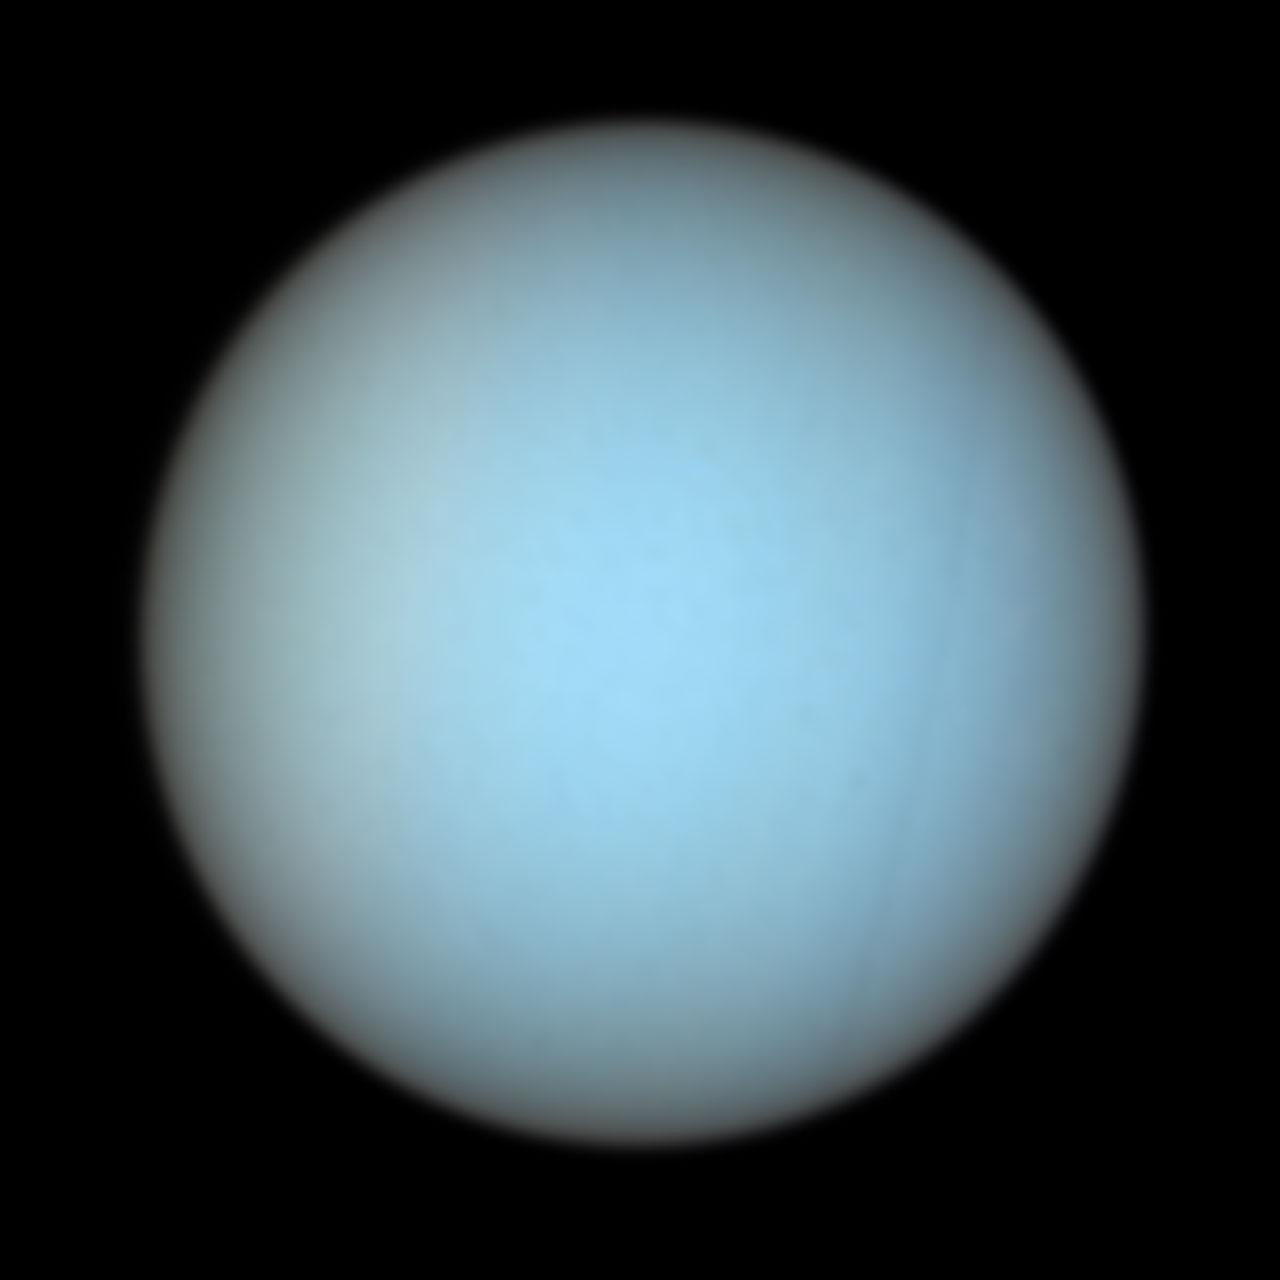 3d Wallpaper Solar System Uranus In Natural Colors Esa Hubble